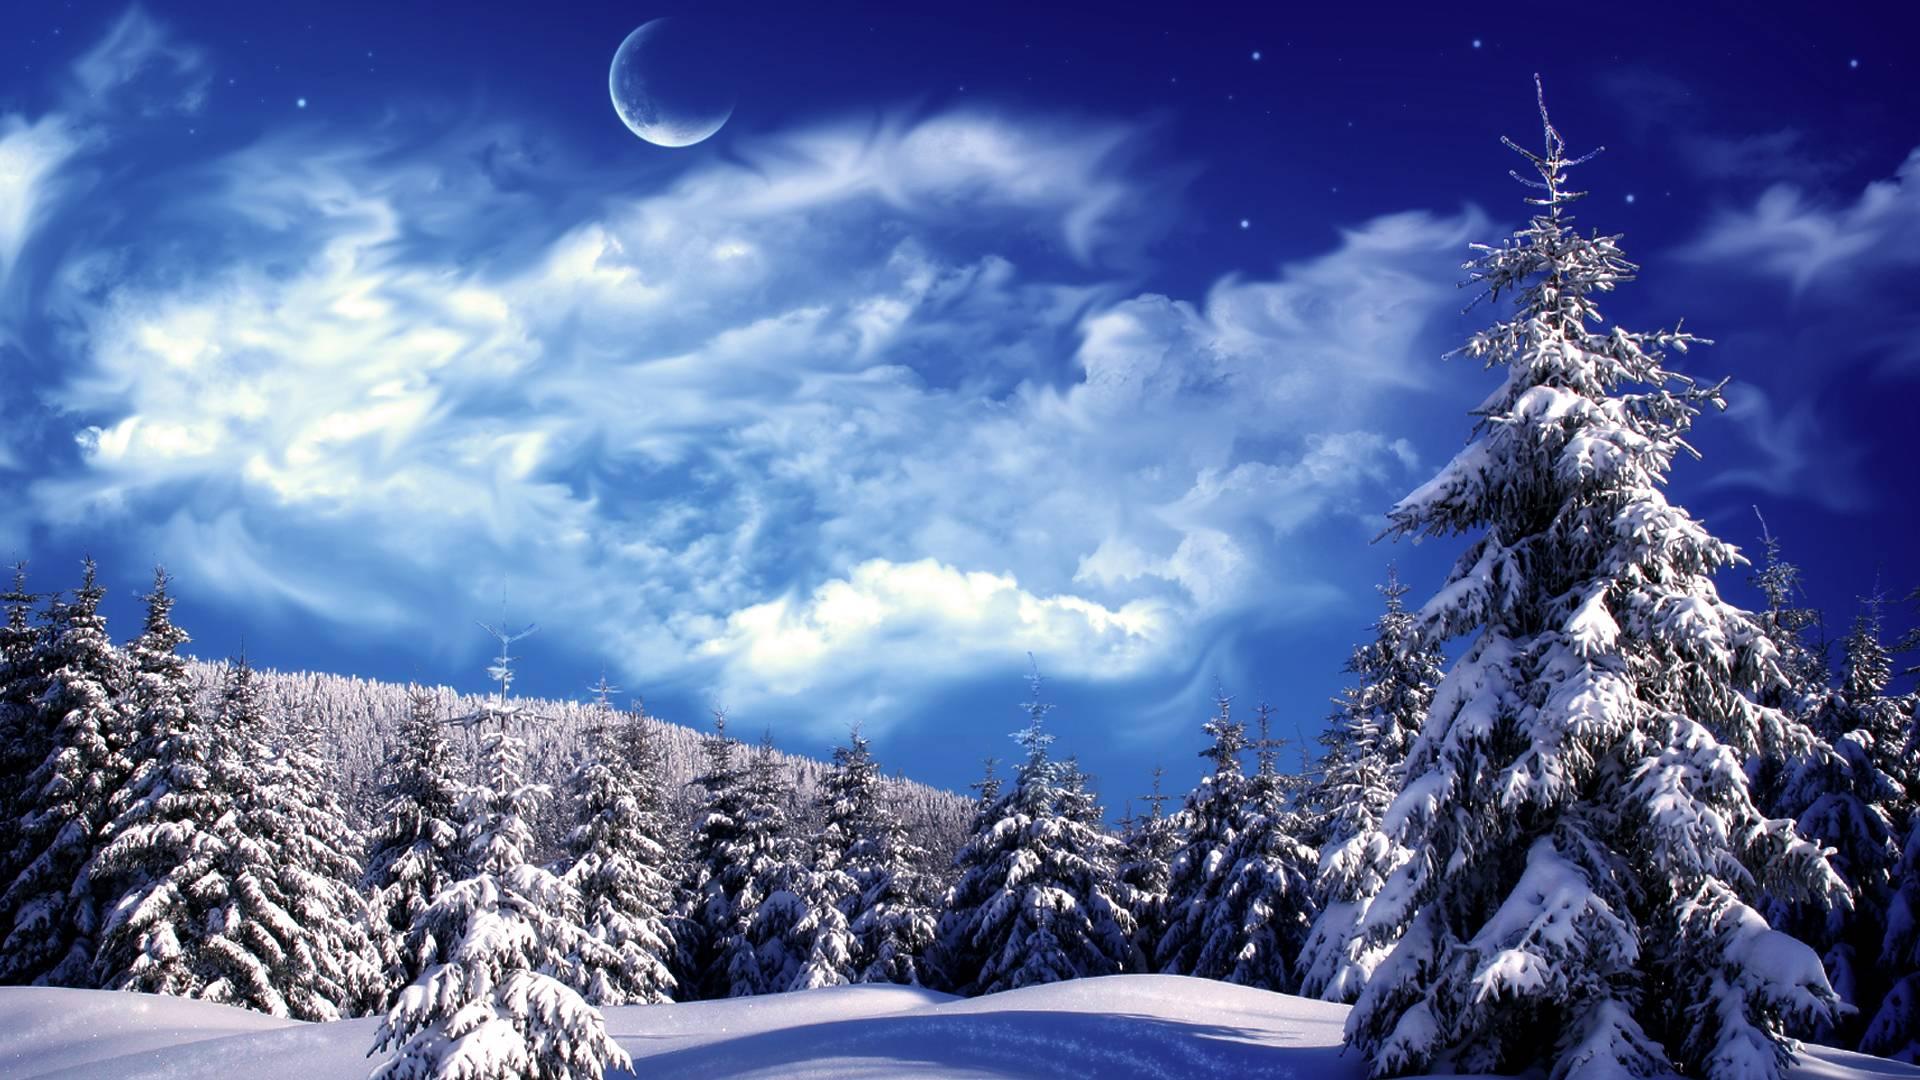 winter wonderland wallpaper wide or hd fantasy wallpapers